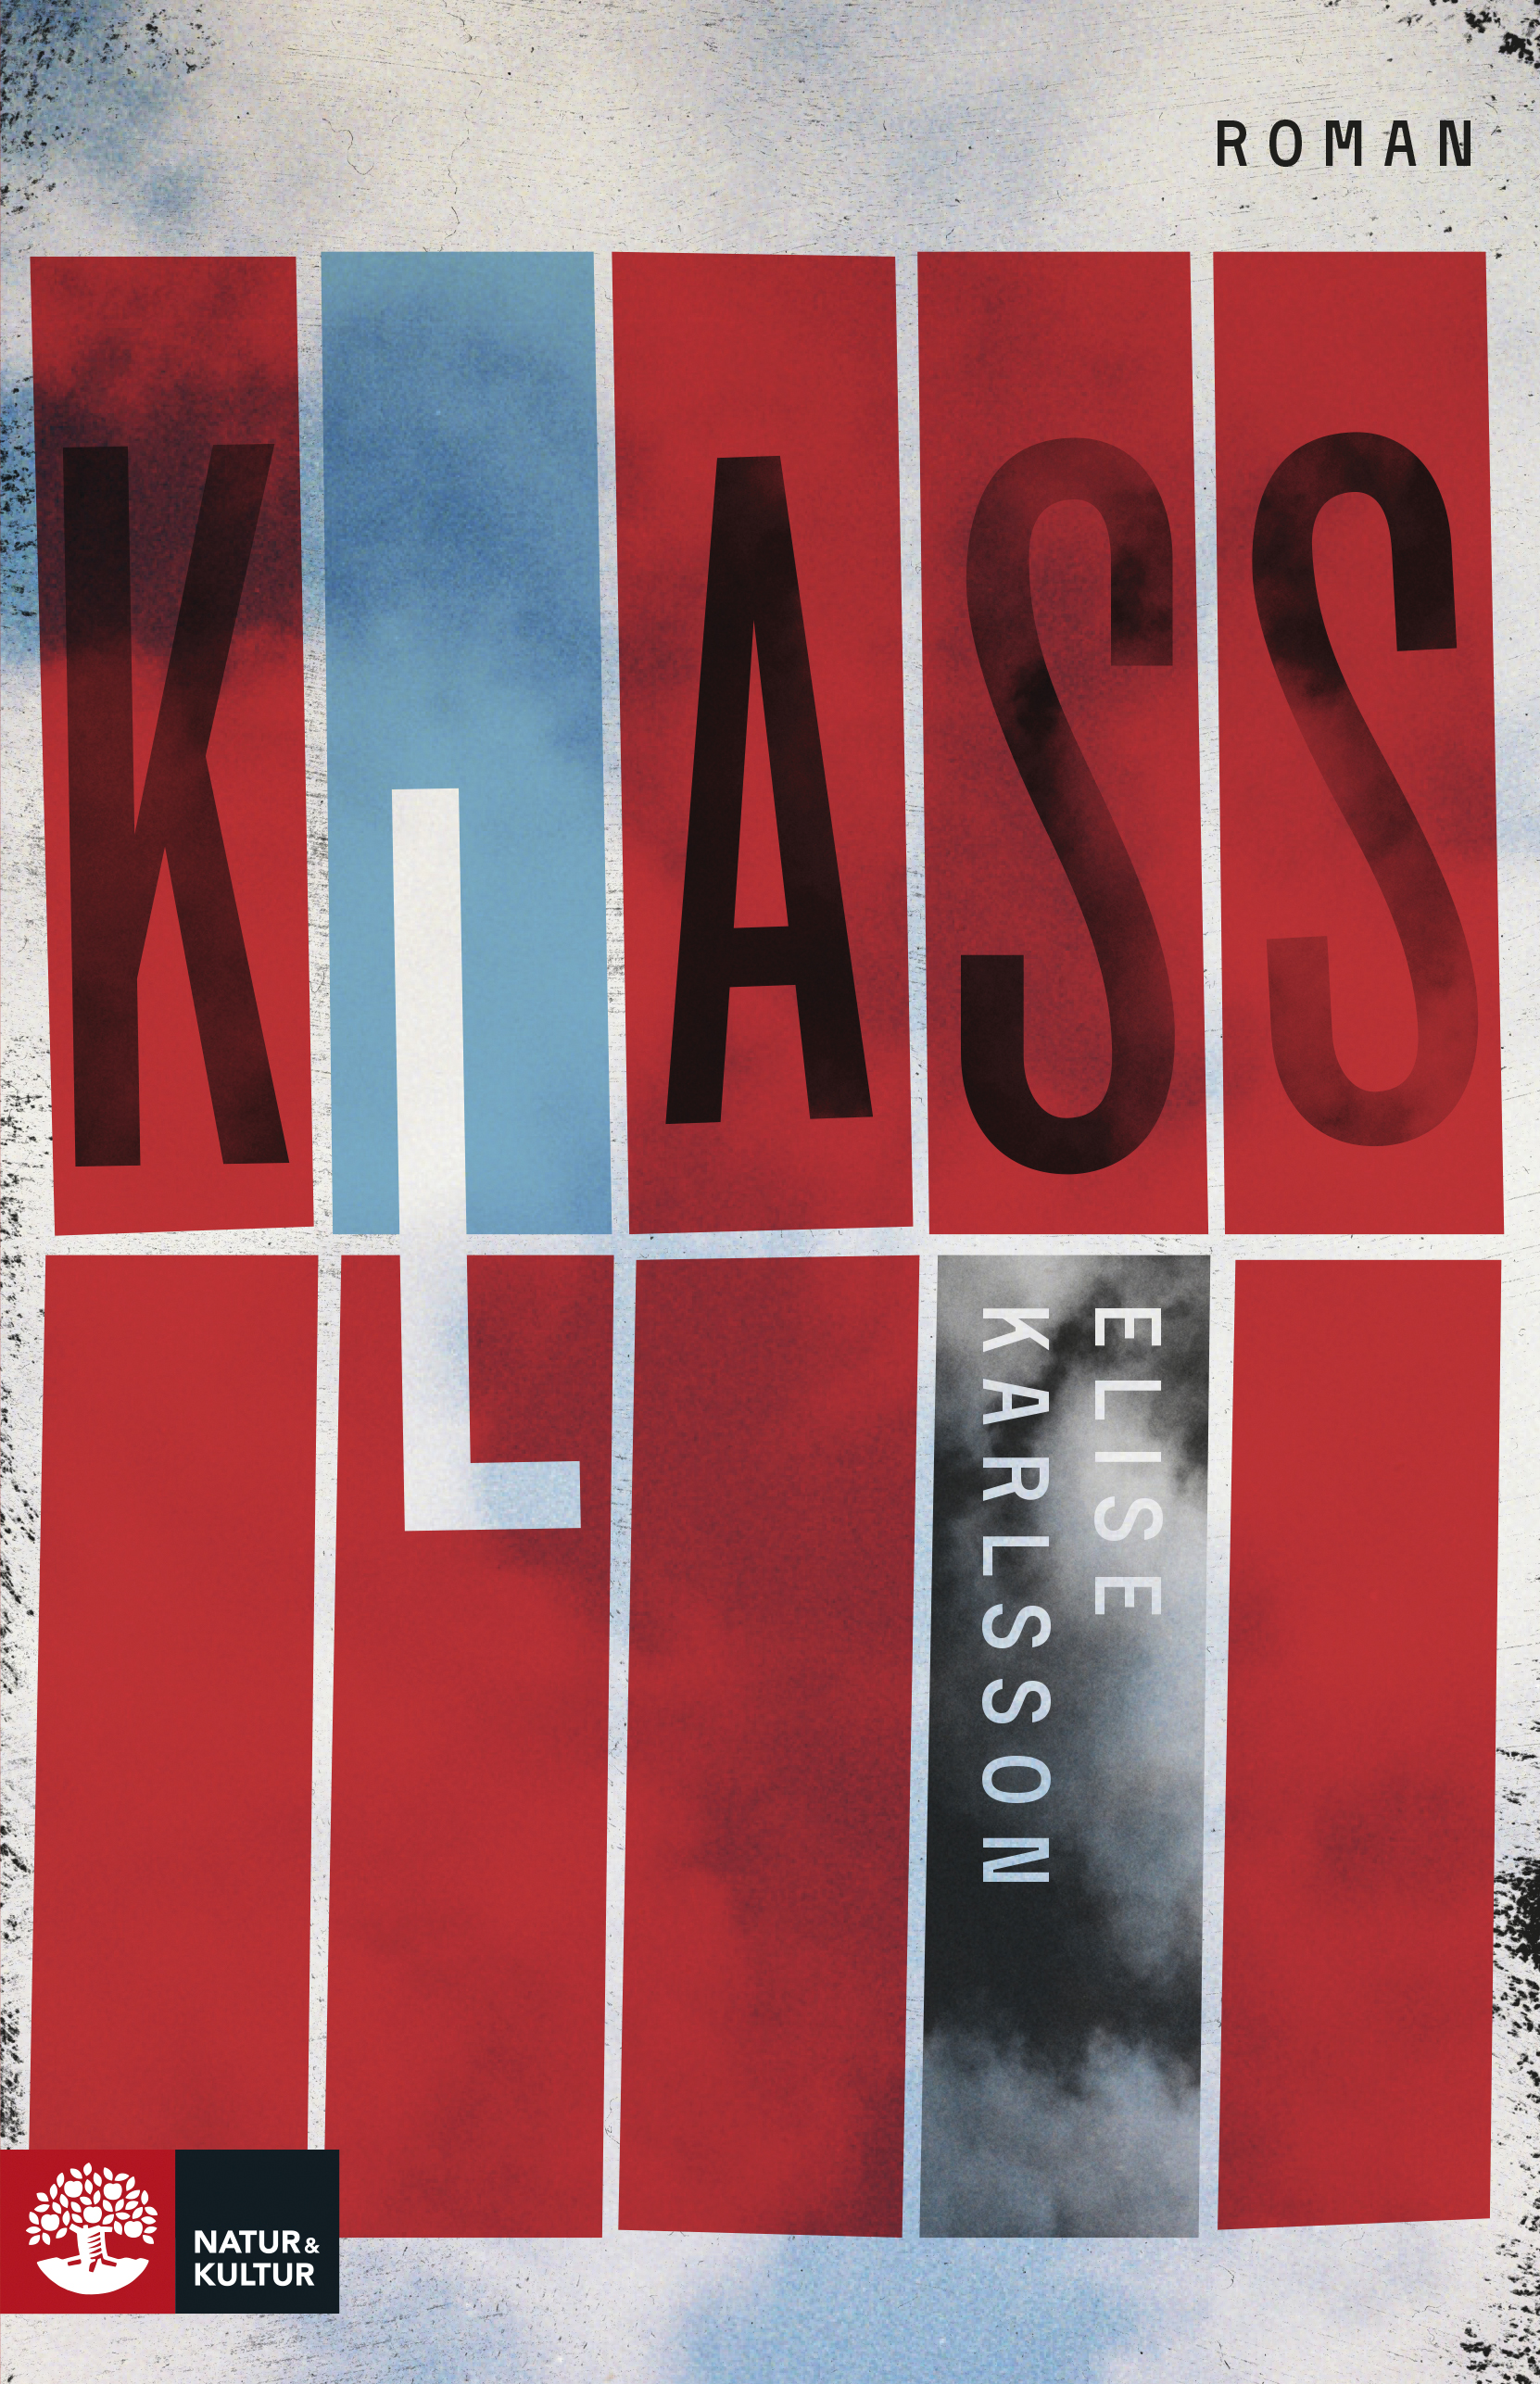 Copy of Klass